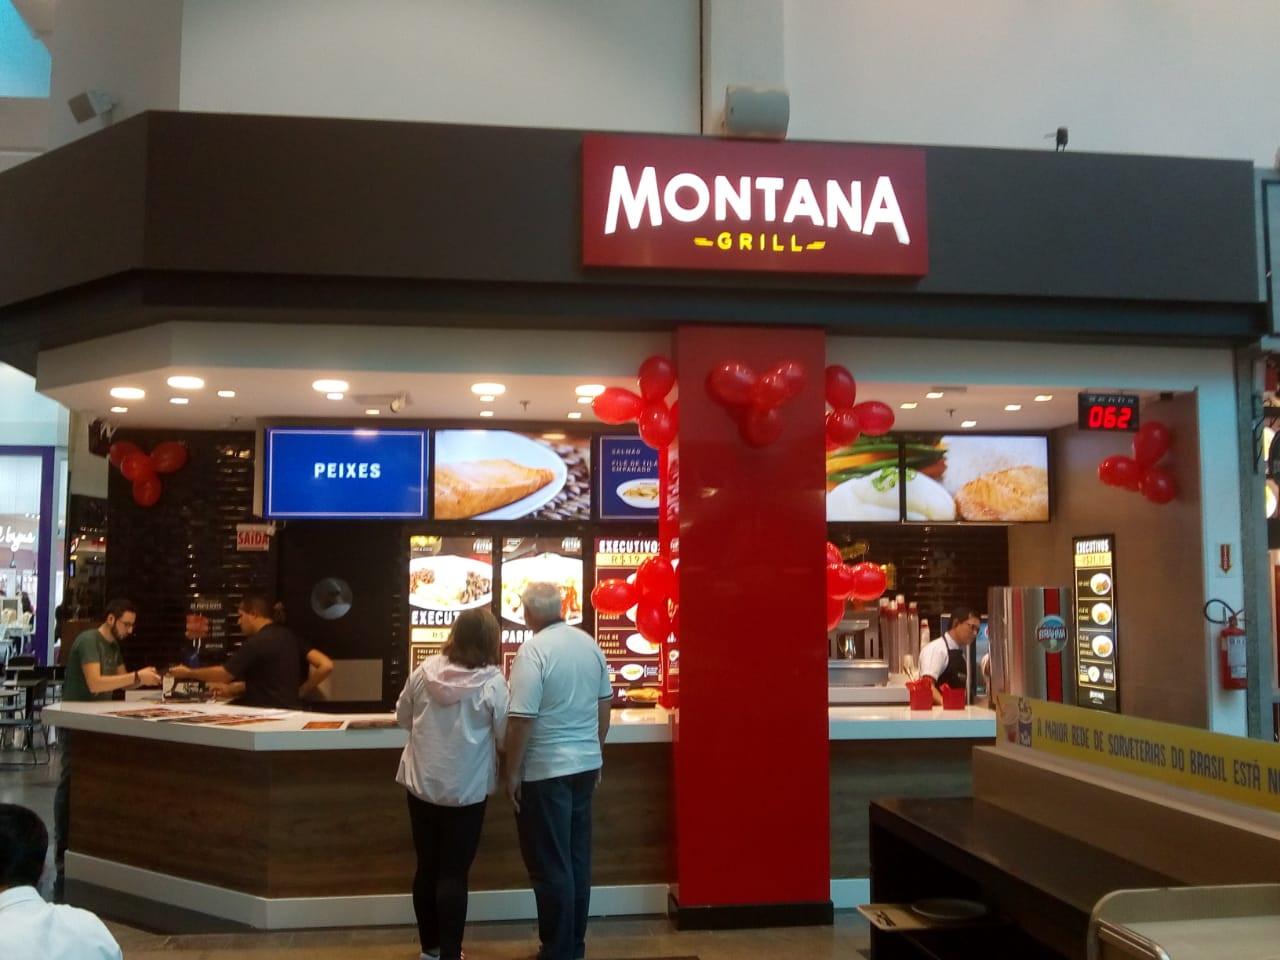 Montana Grill inaugura unidade em Blumenau